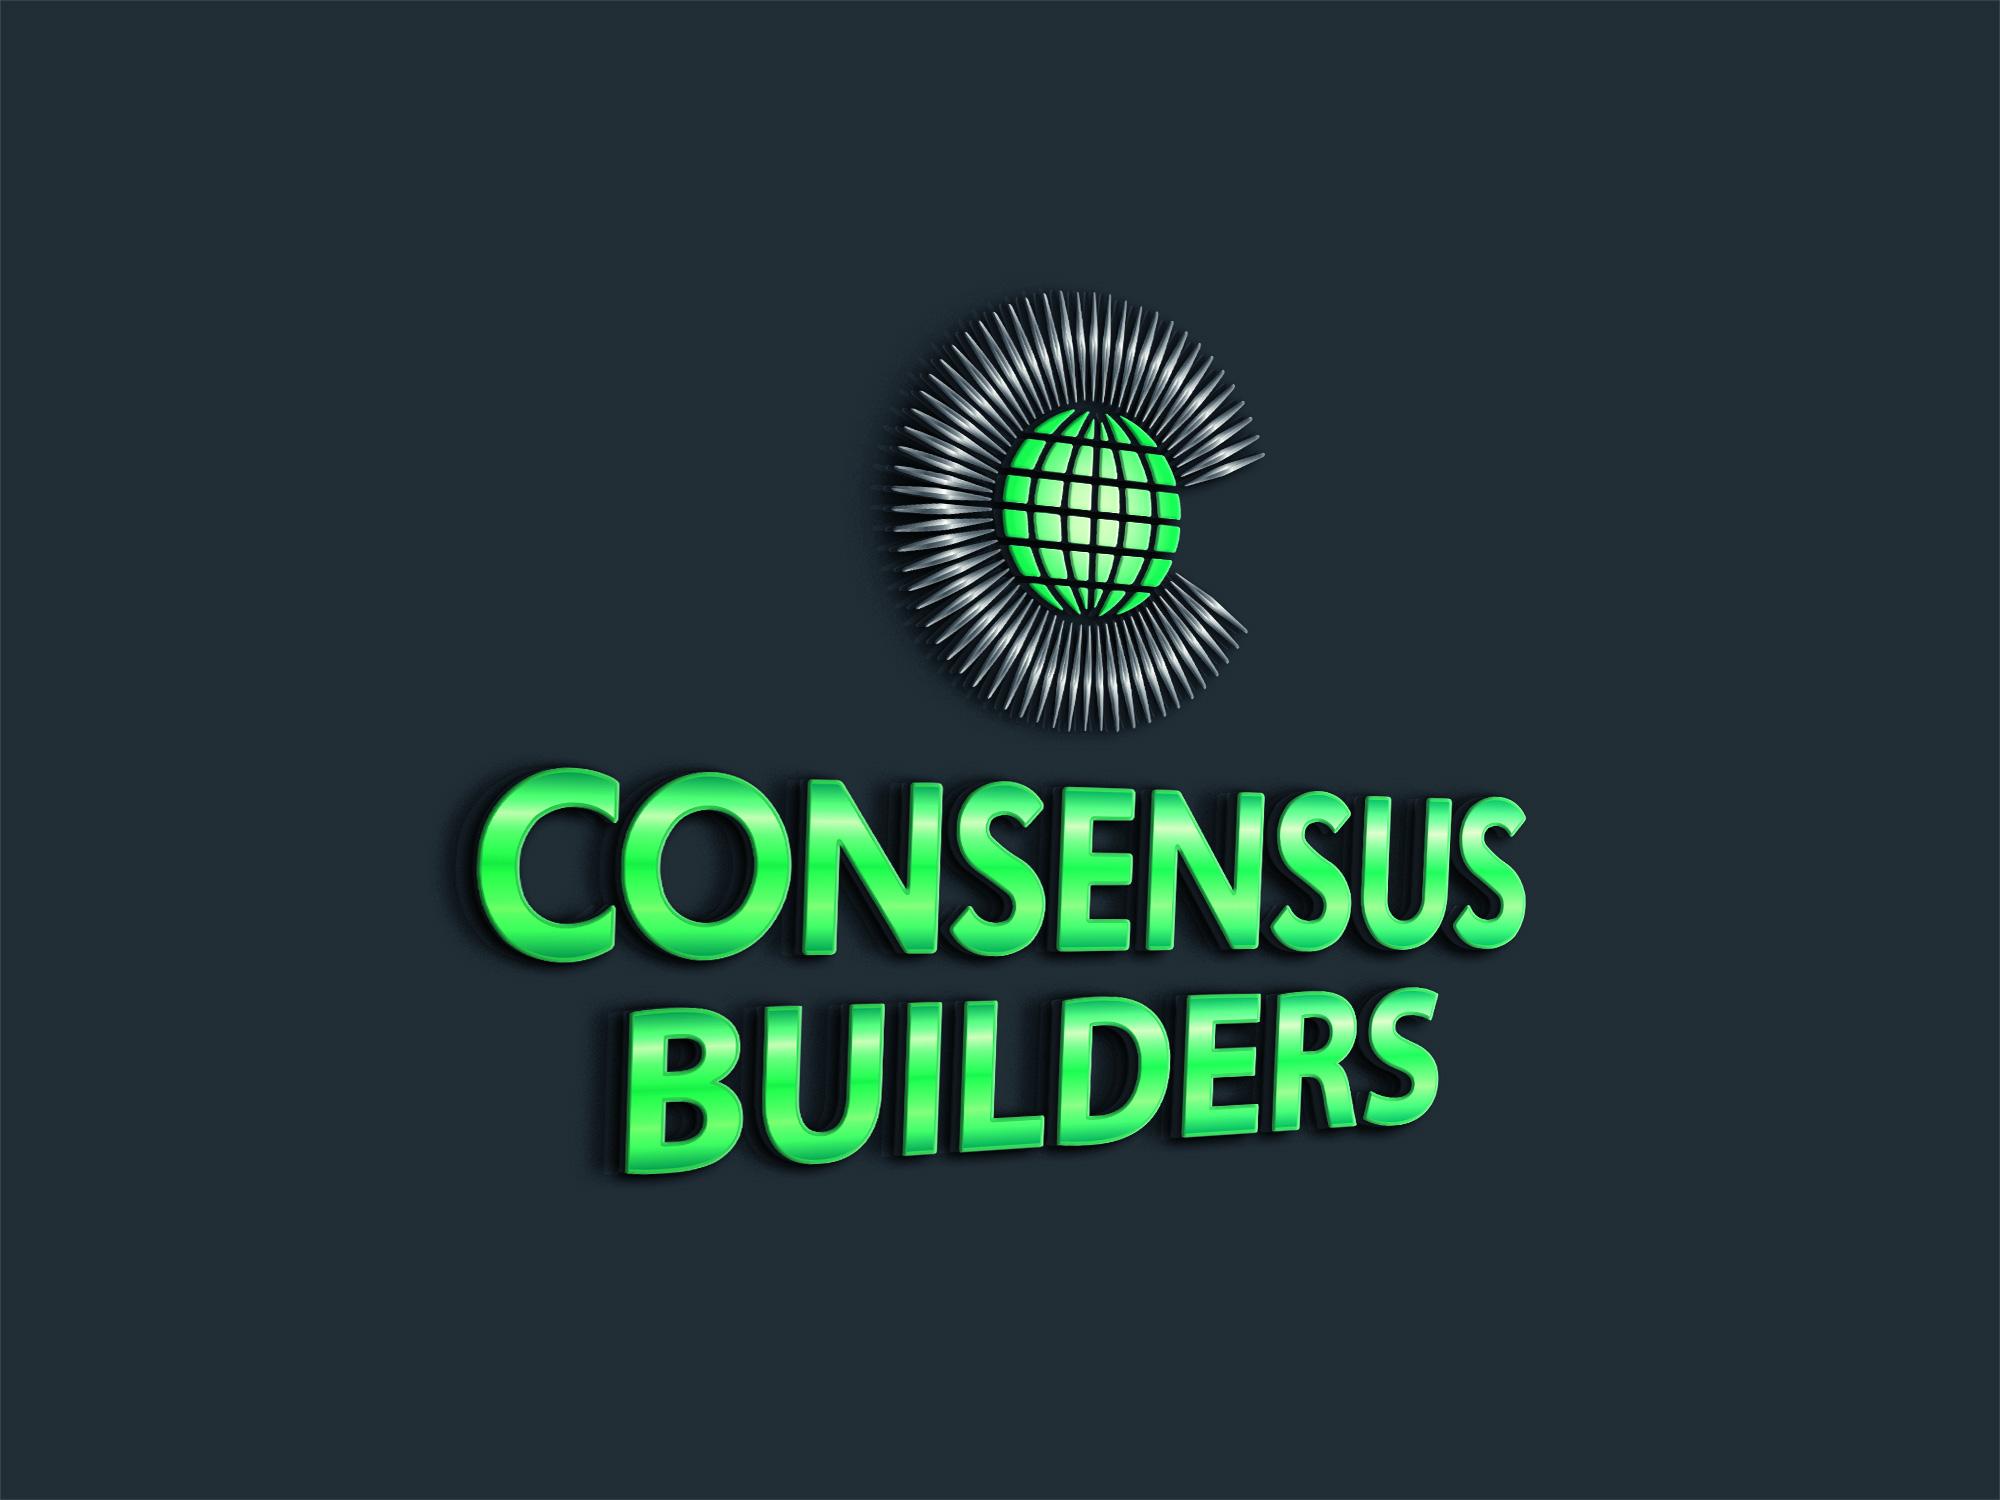 Consensus Builders  company logo